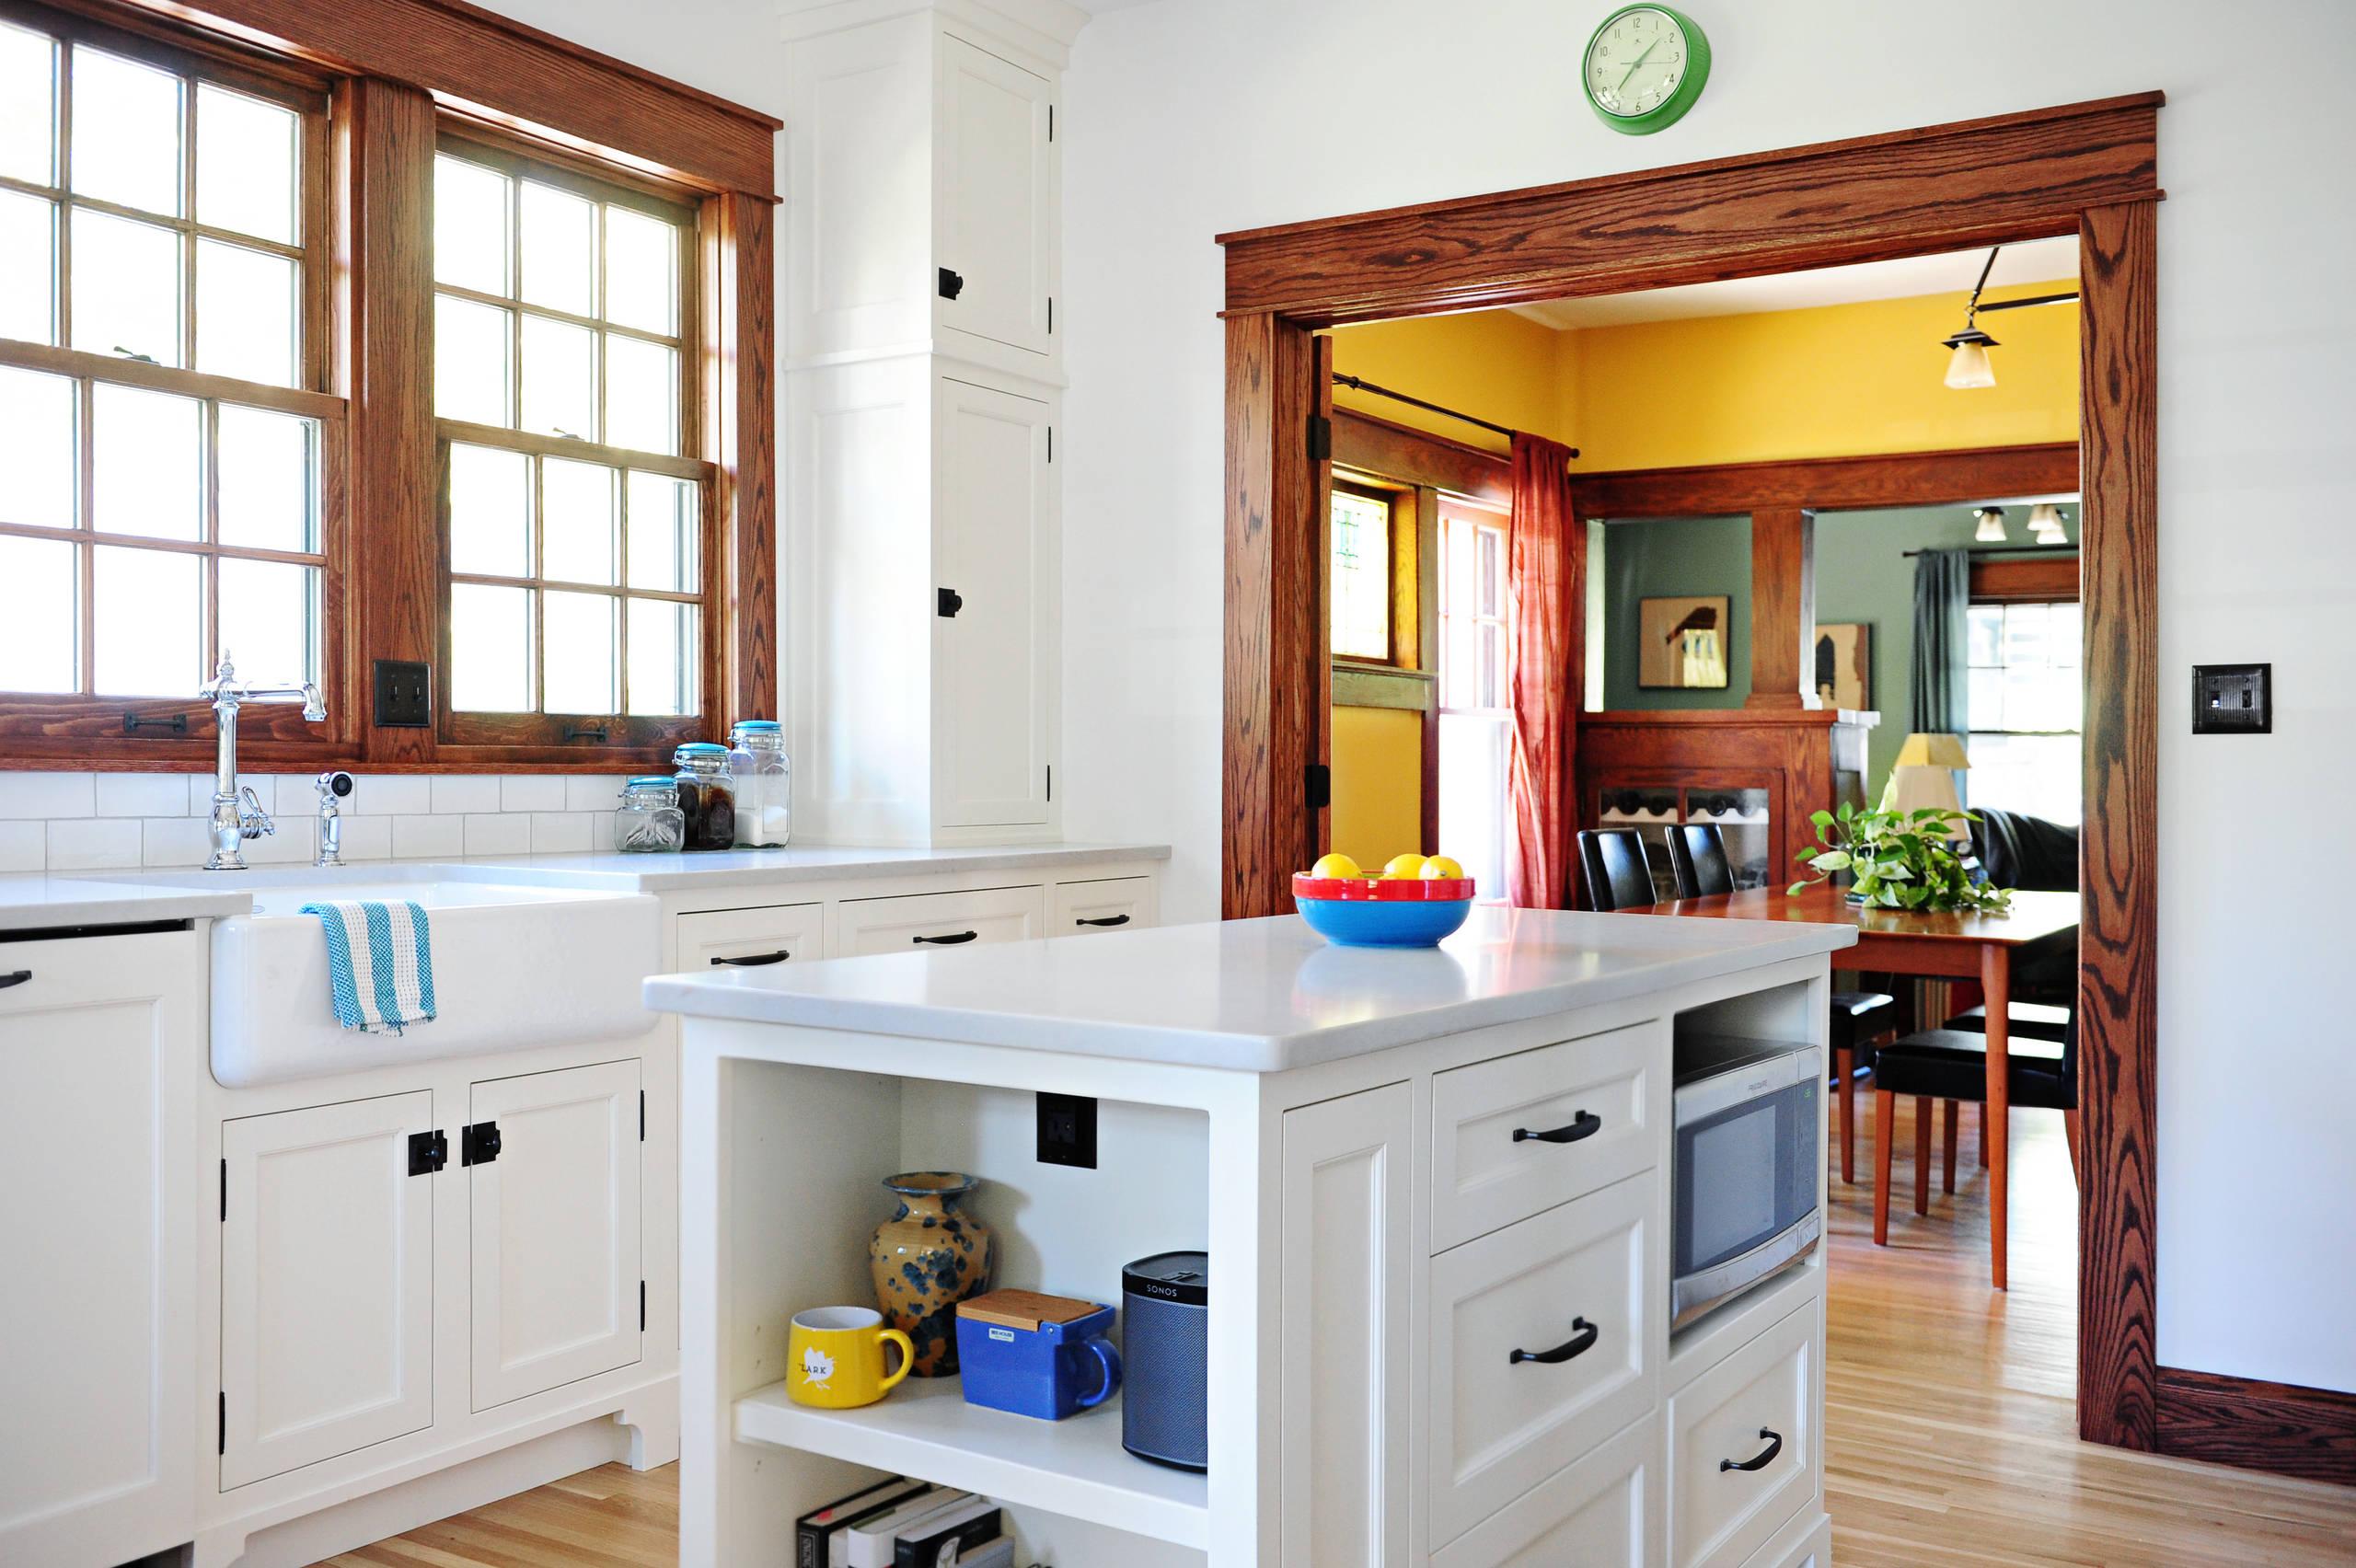 75 Beautiful Craftsman White Kitchen Pictures Ideas November 2020 Houzz